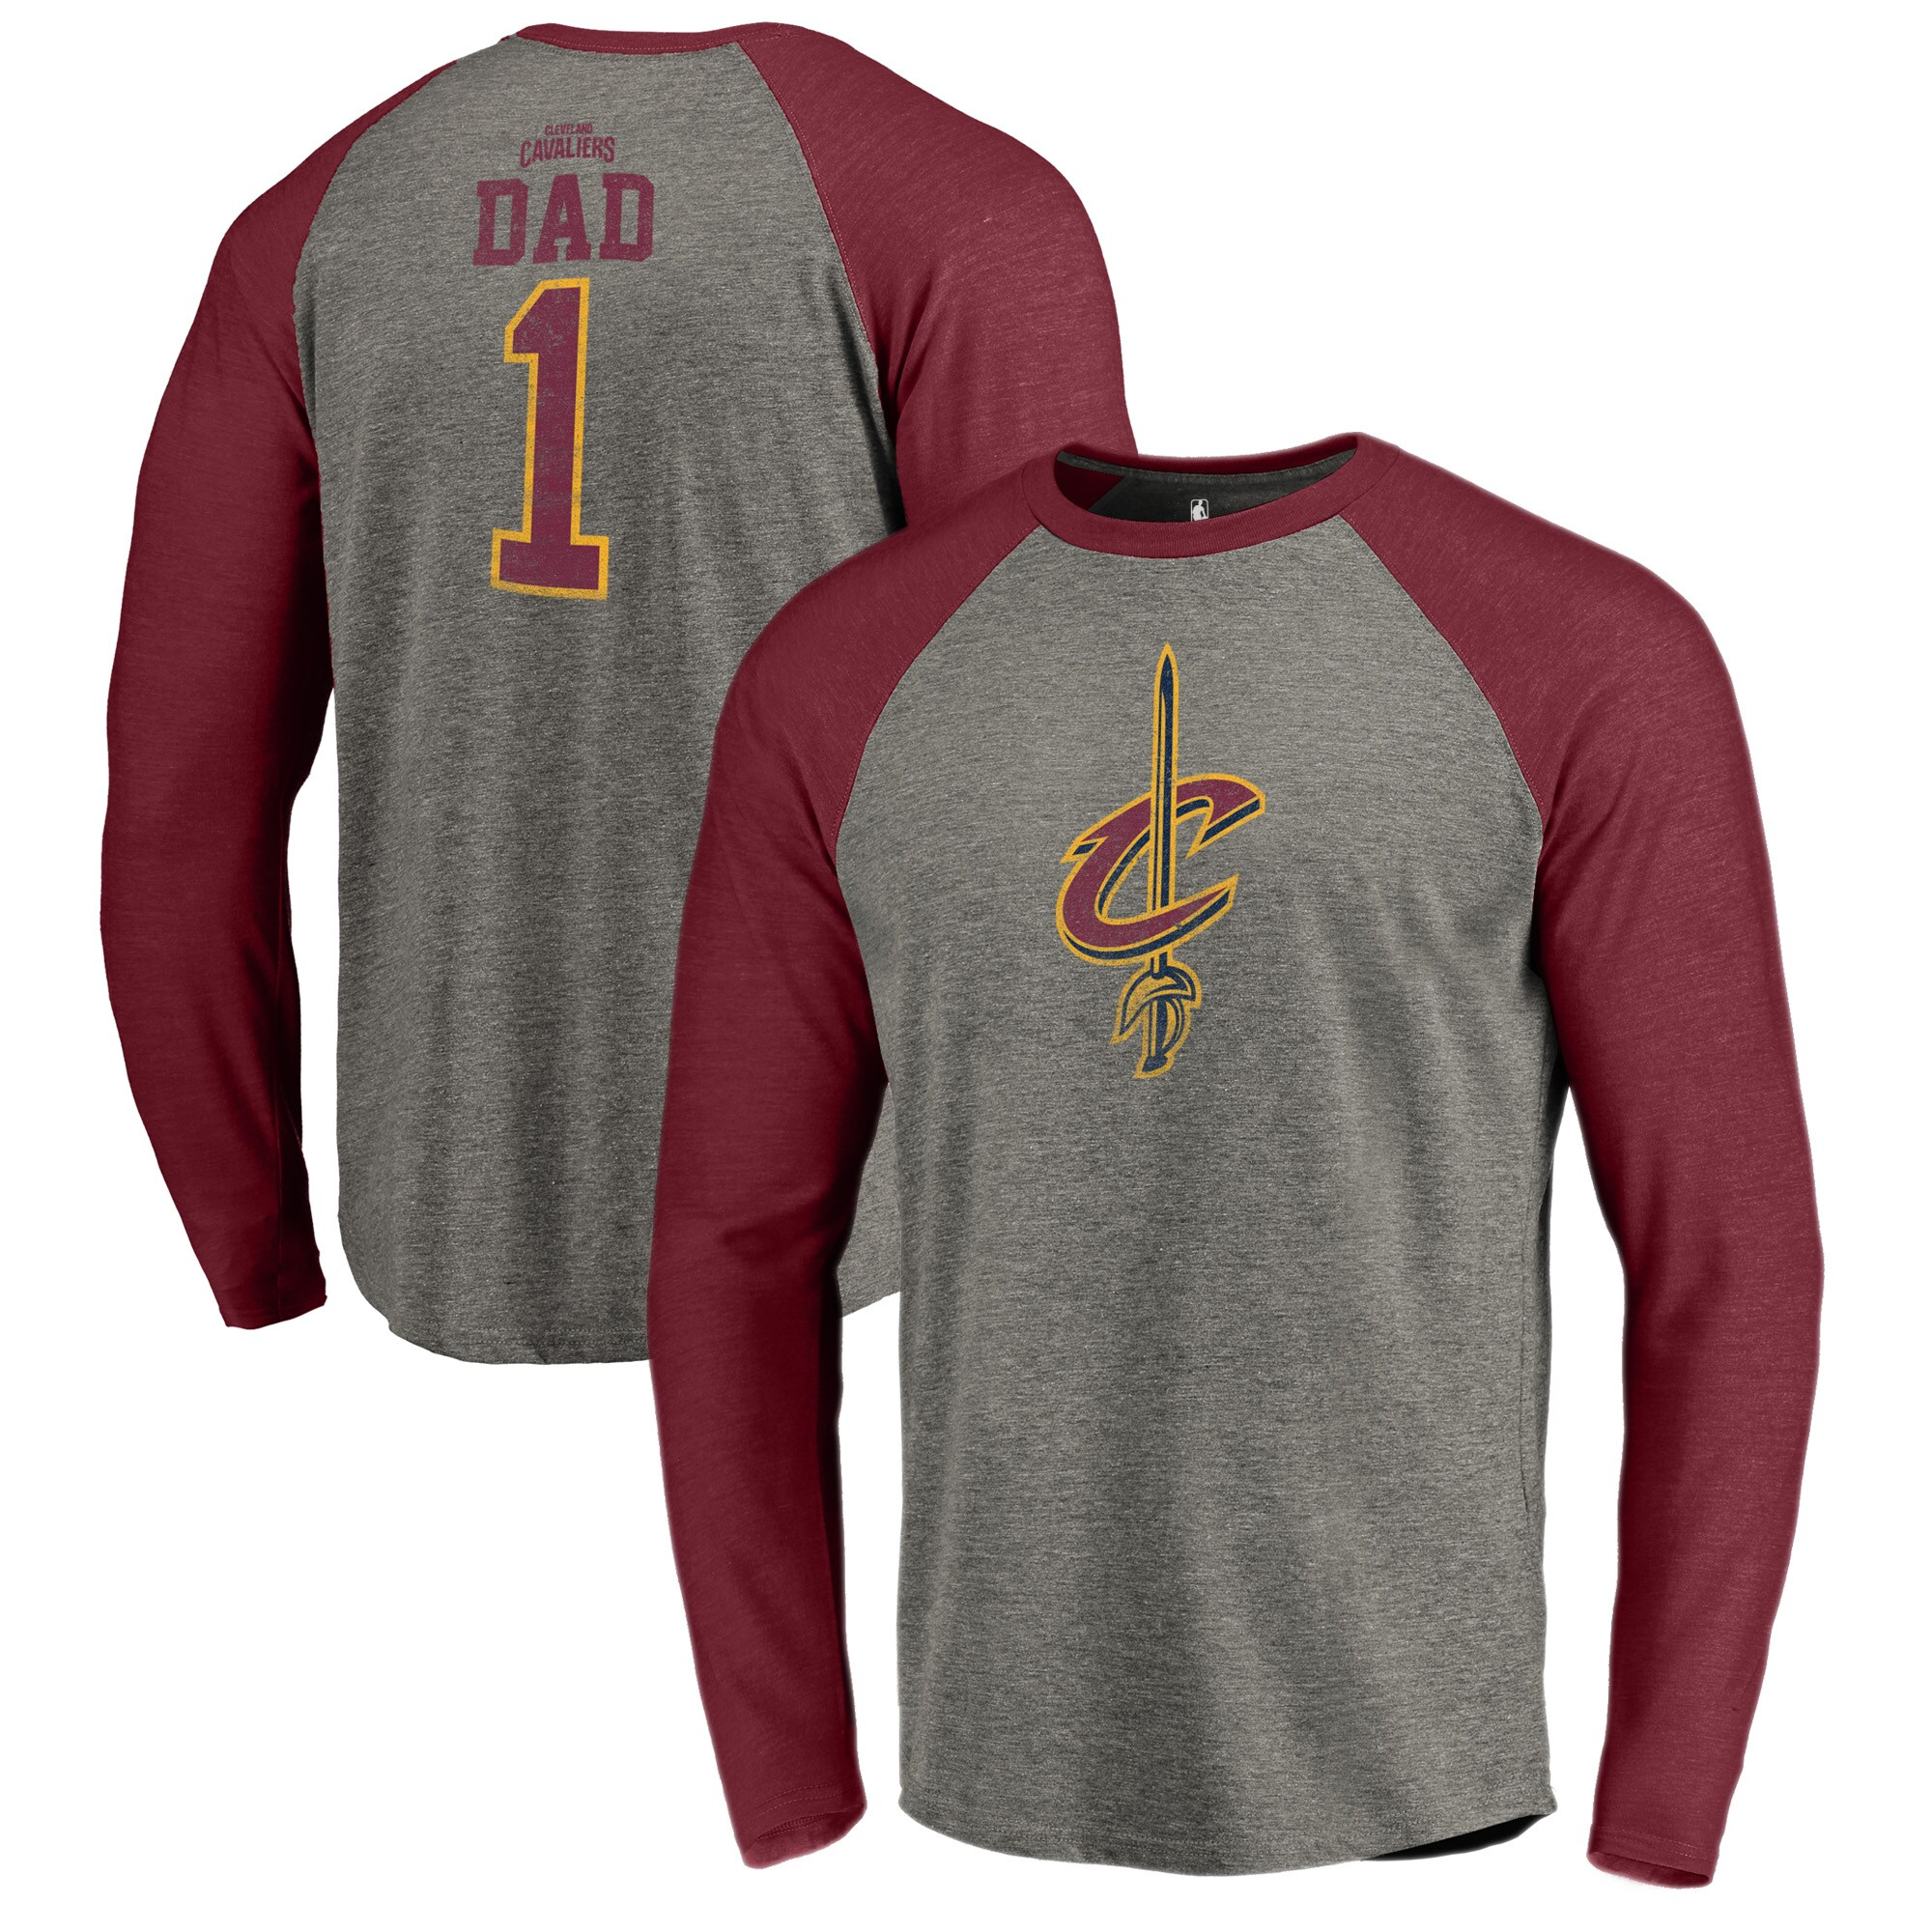 Cleveland Cavaliers Fanatics Branded Greatest Dad Long Sleeve Tri-Blend Raglan T-Shirt - Heathered Gray